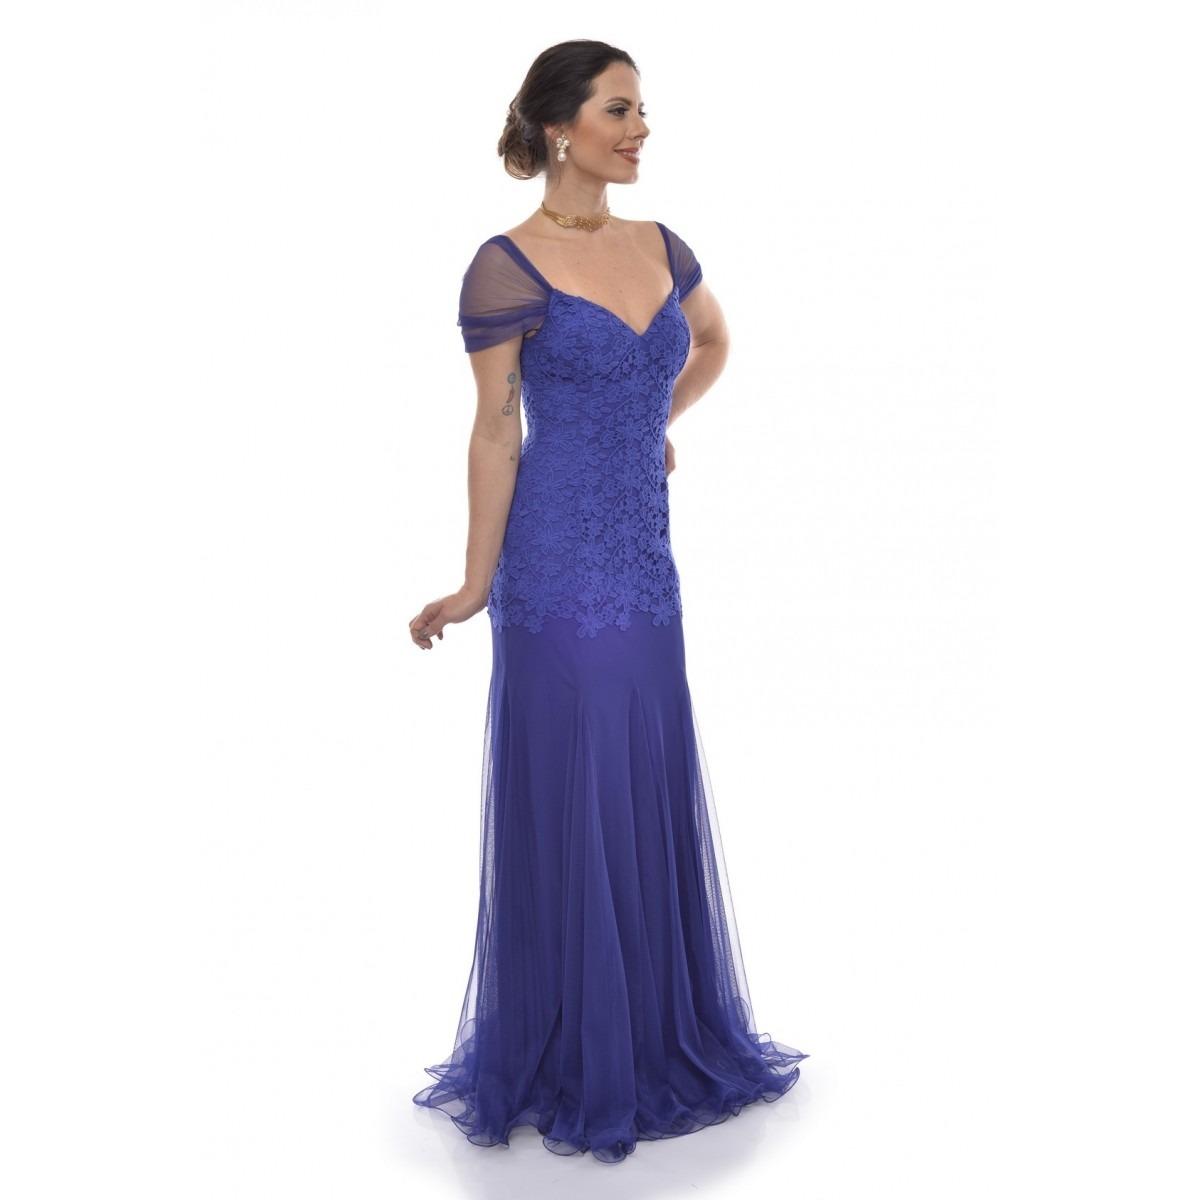 1d4dbd255 vestido longo azul royal tule guipir sophia. Carregando zoom.